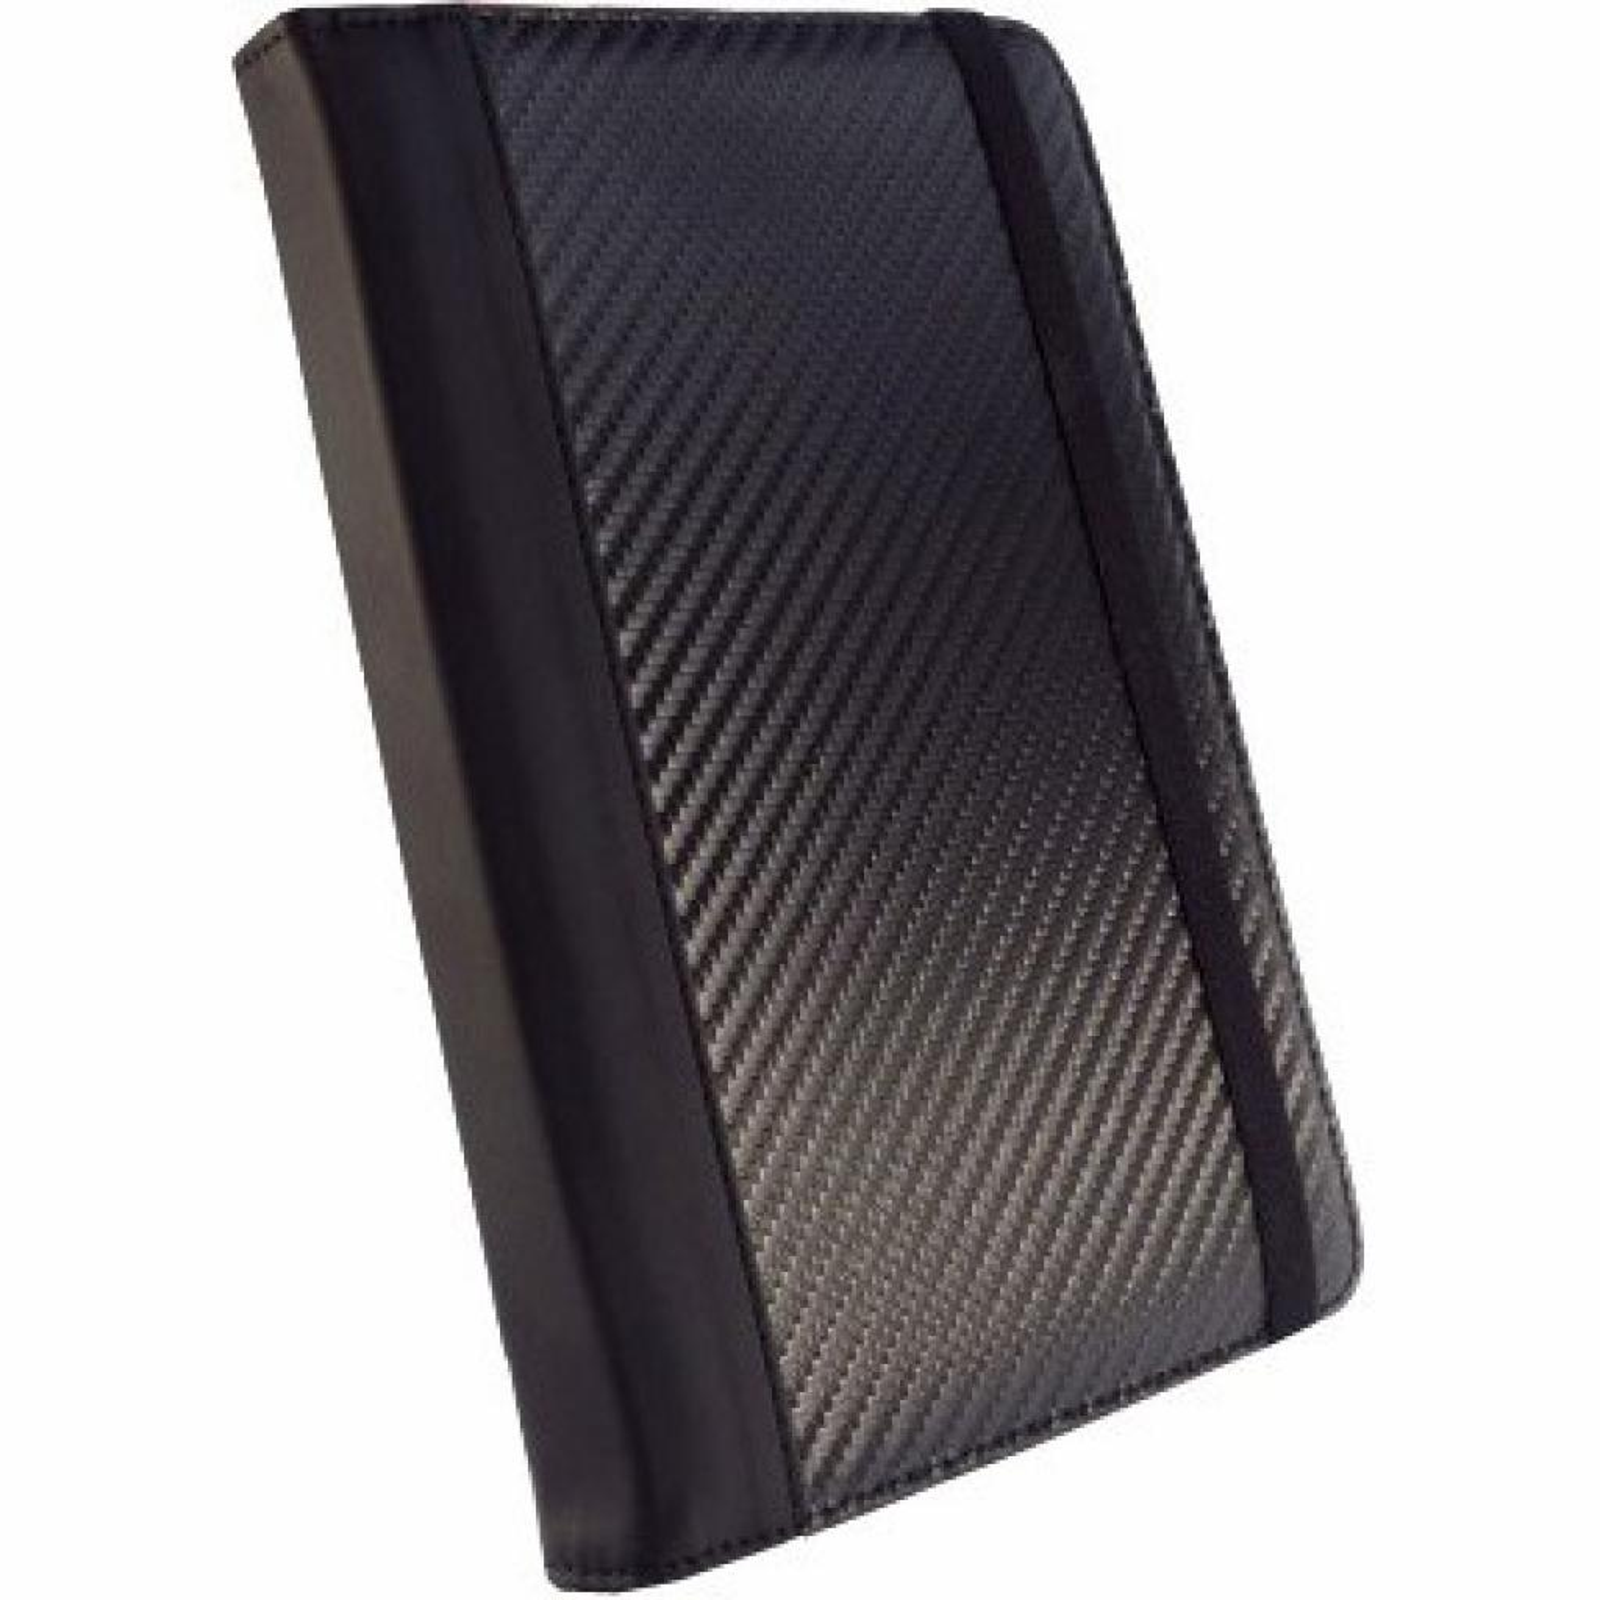 Чехол для планшета Tuff-Luv 7 Slim-Stand Black Carbon (J14_9)